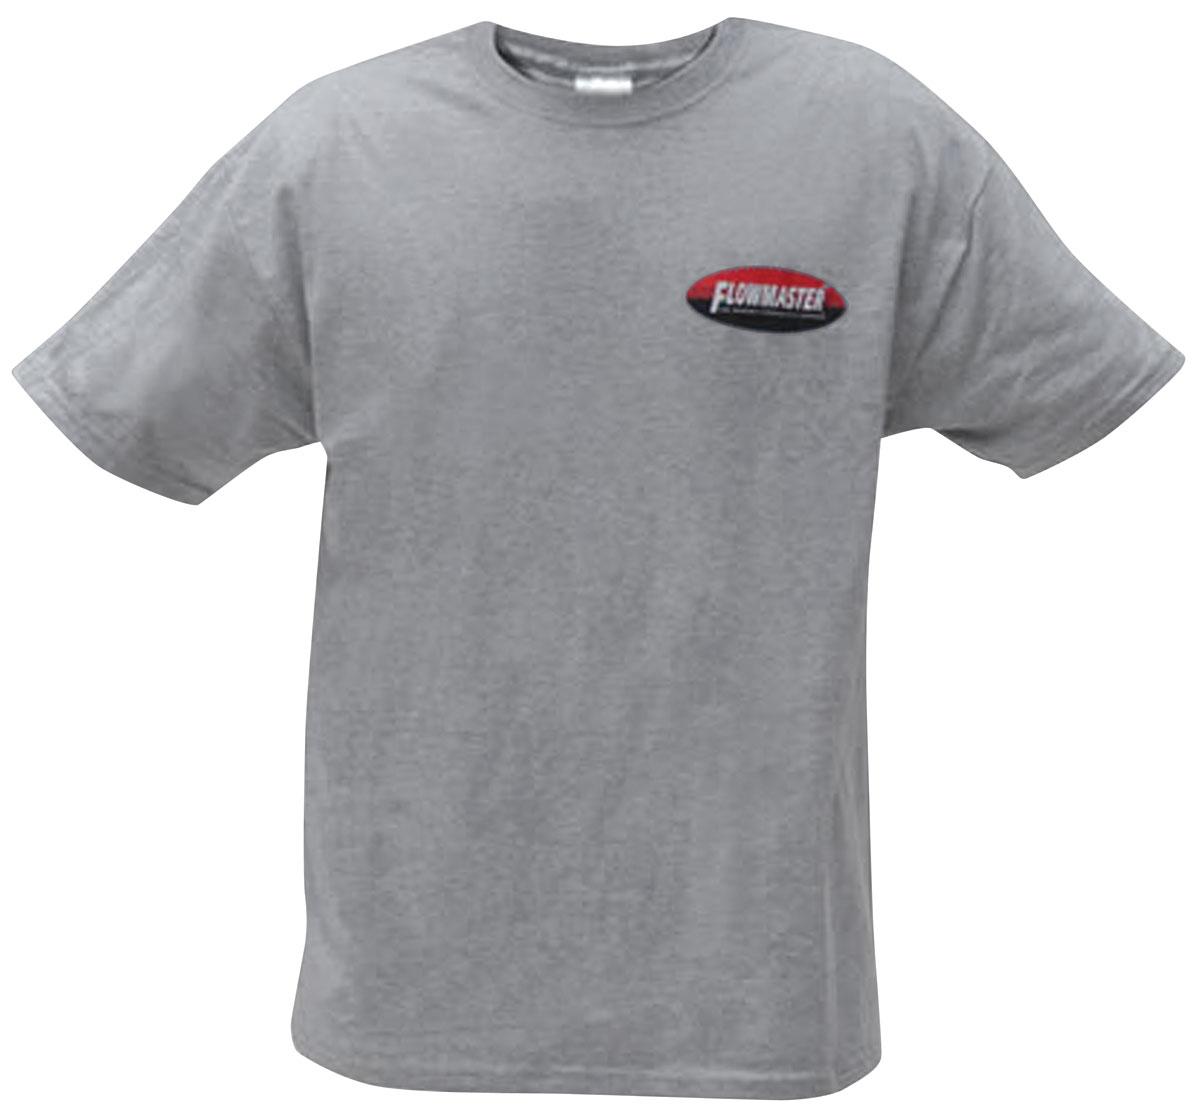 Shirt, Flowmaster Oval Tee, Light Gray